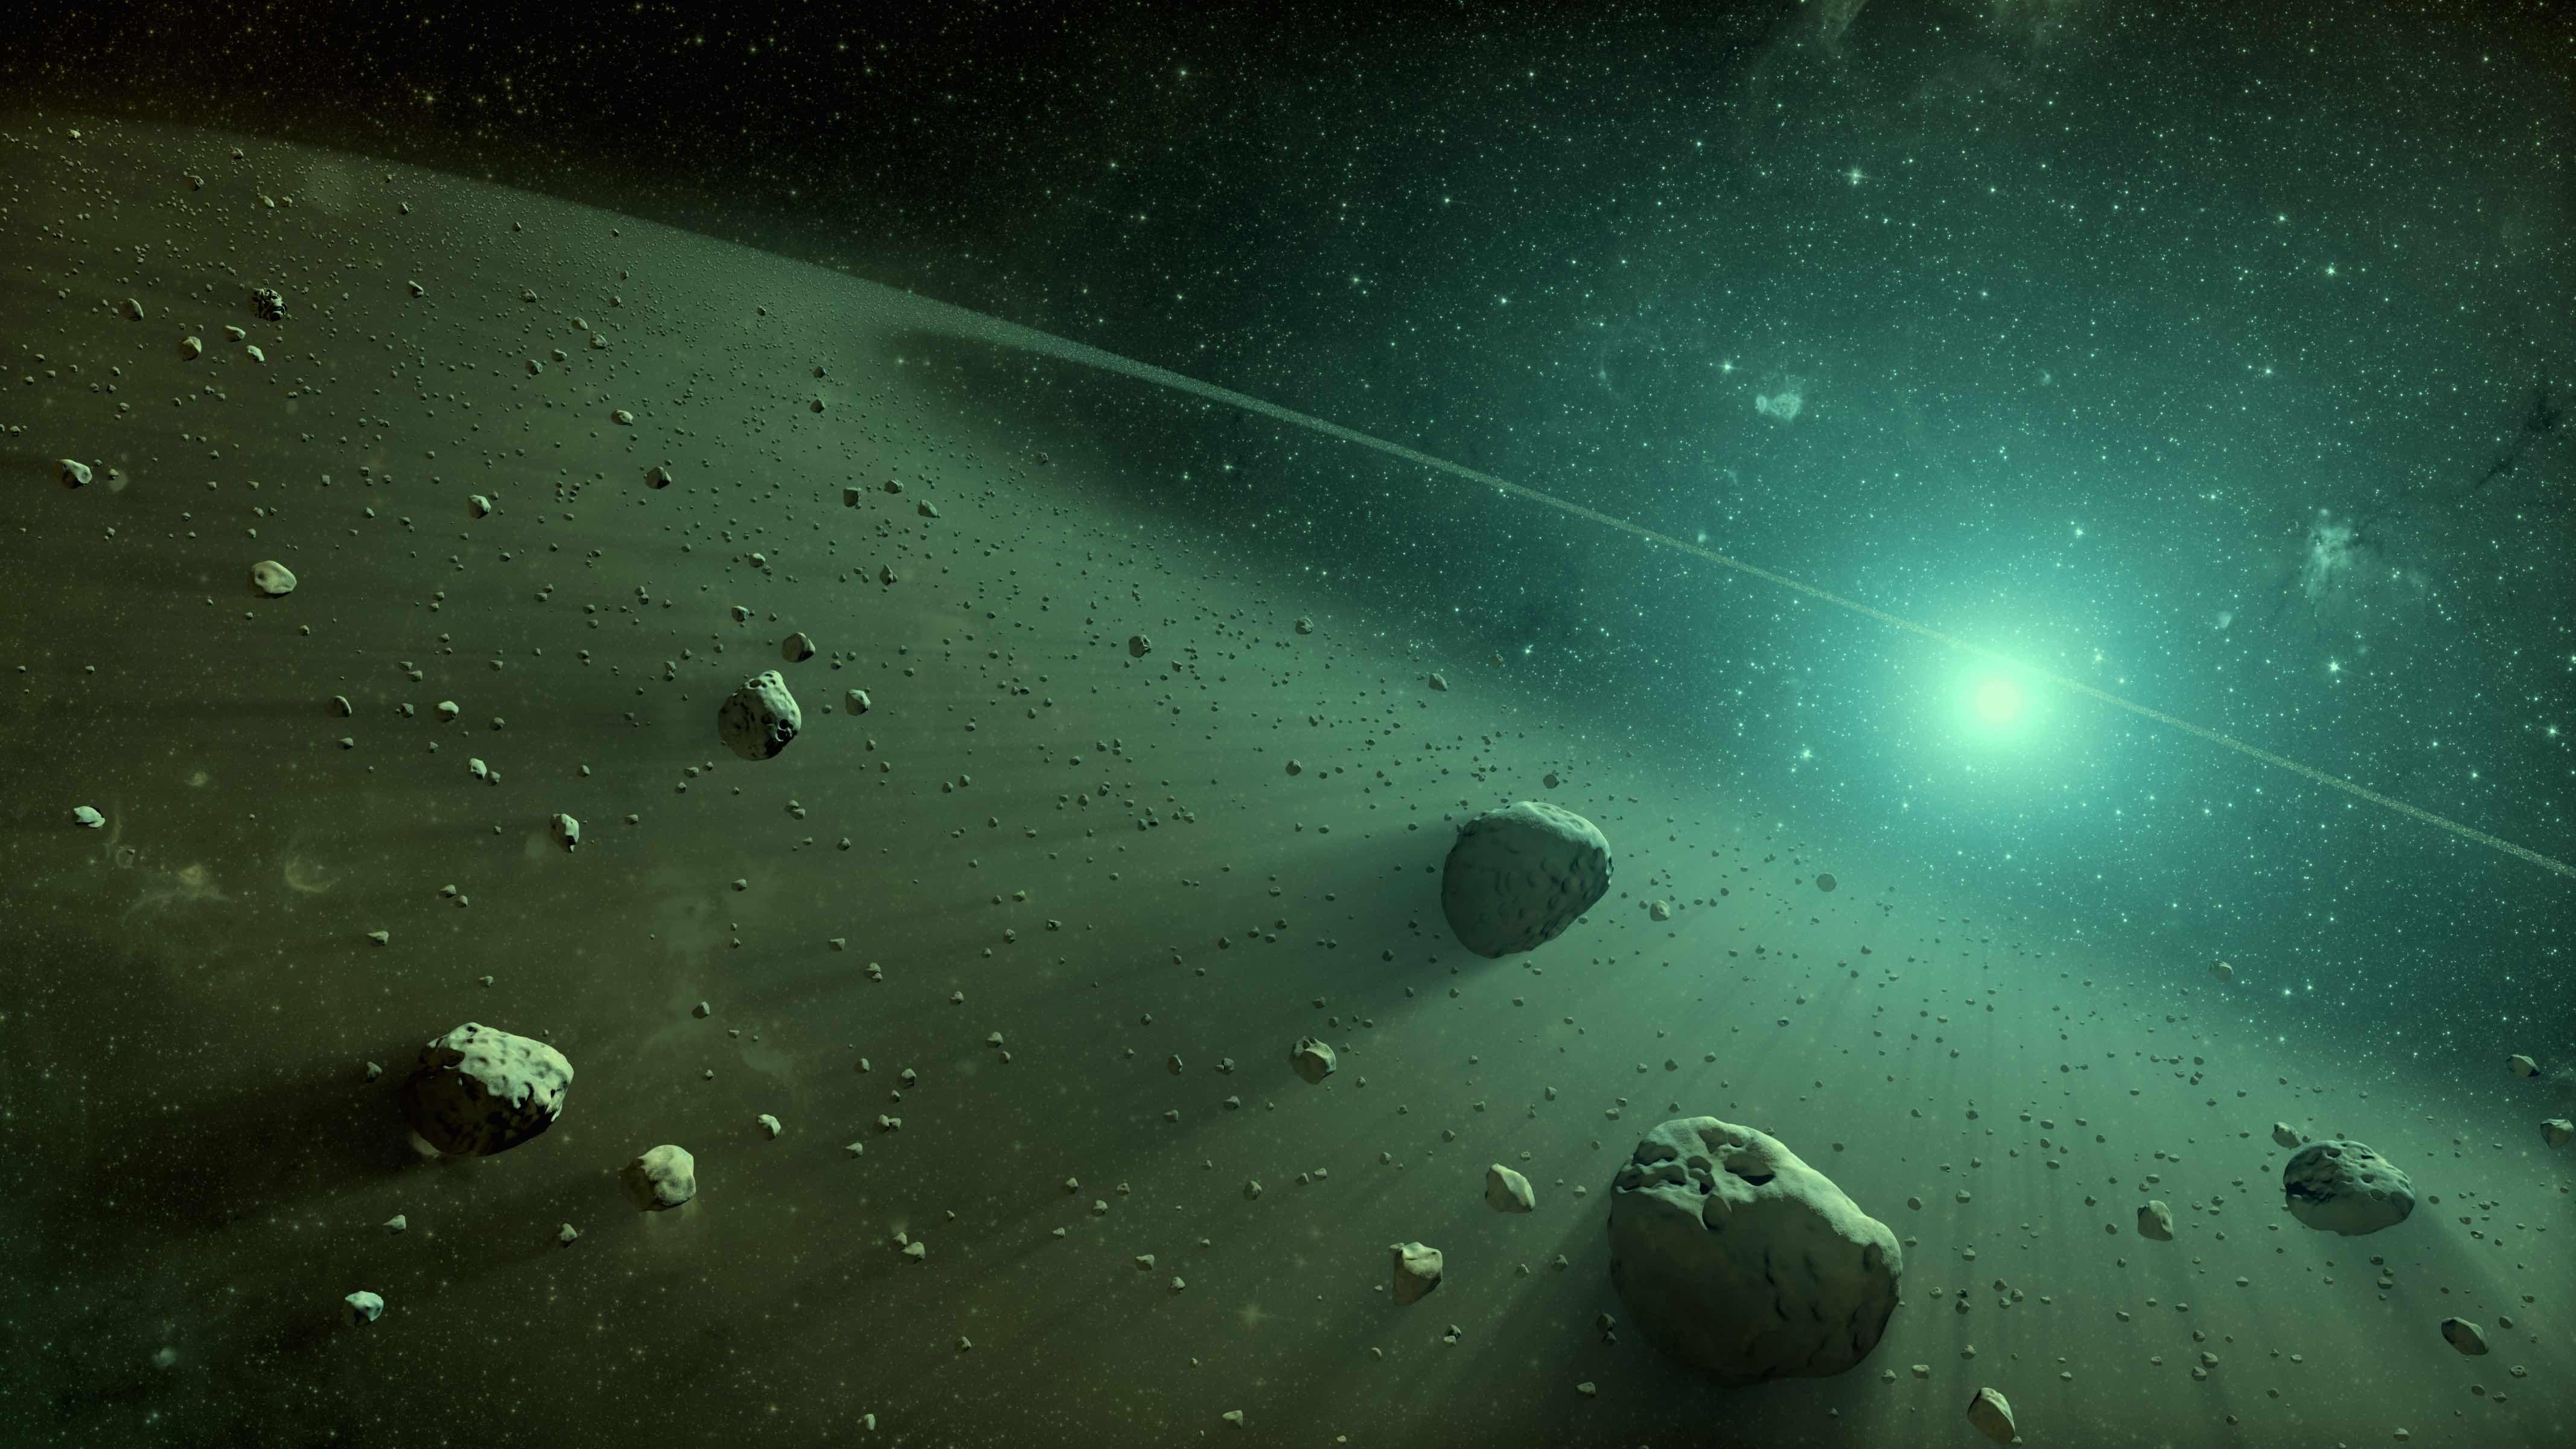 NASA_JPL-Caltech